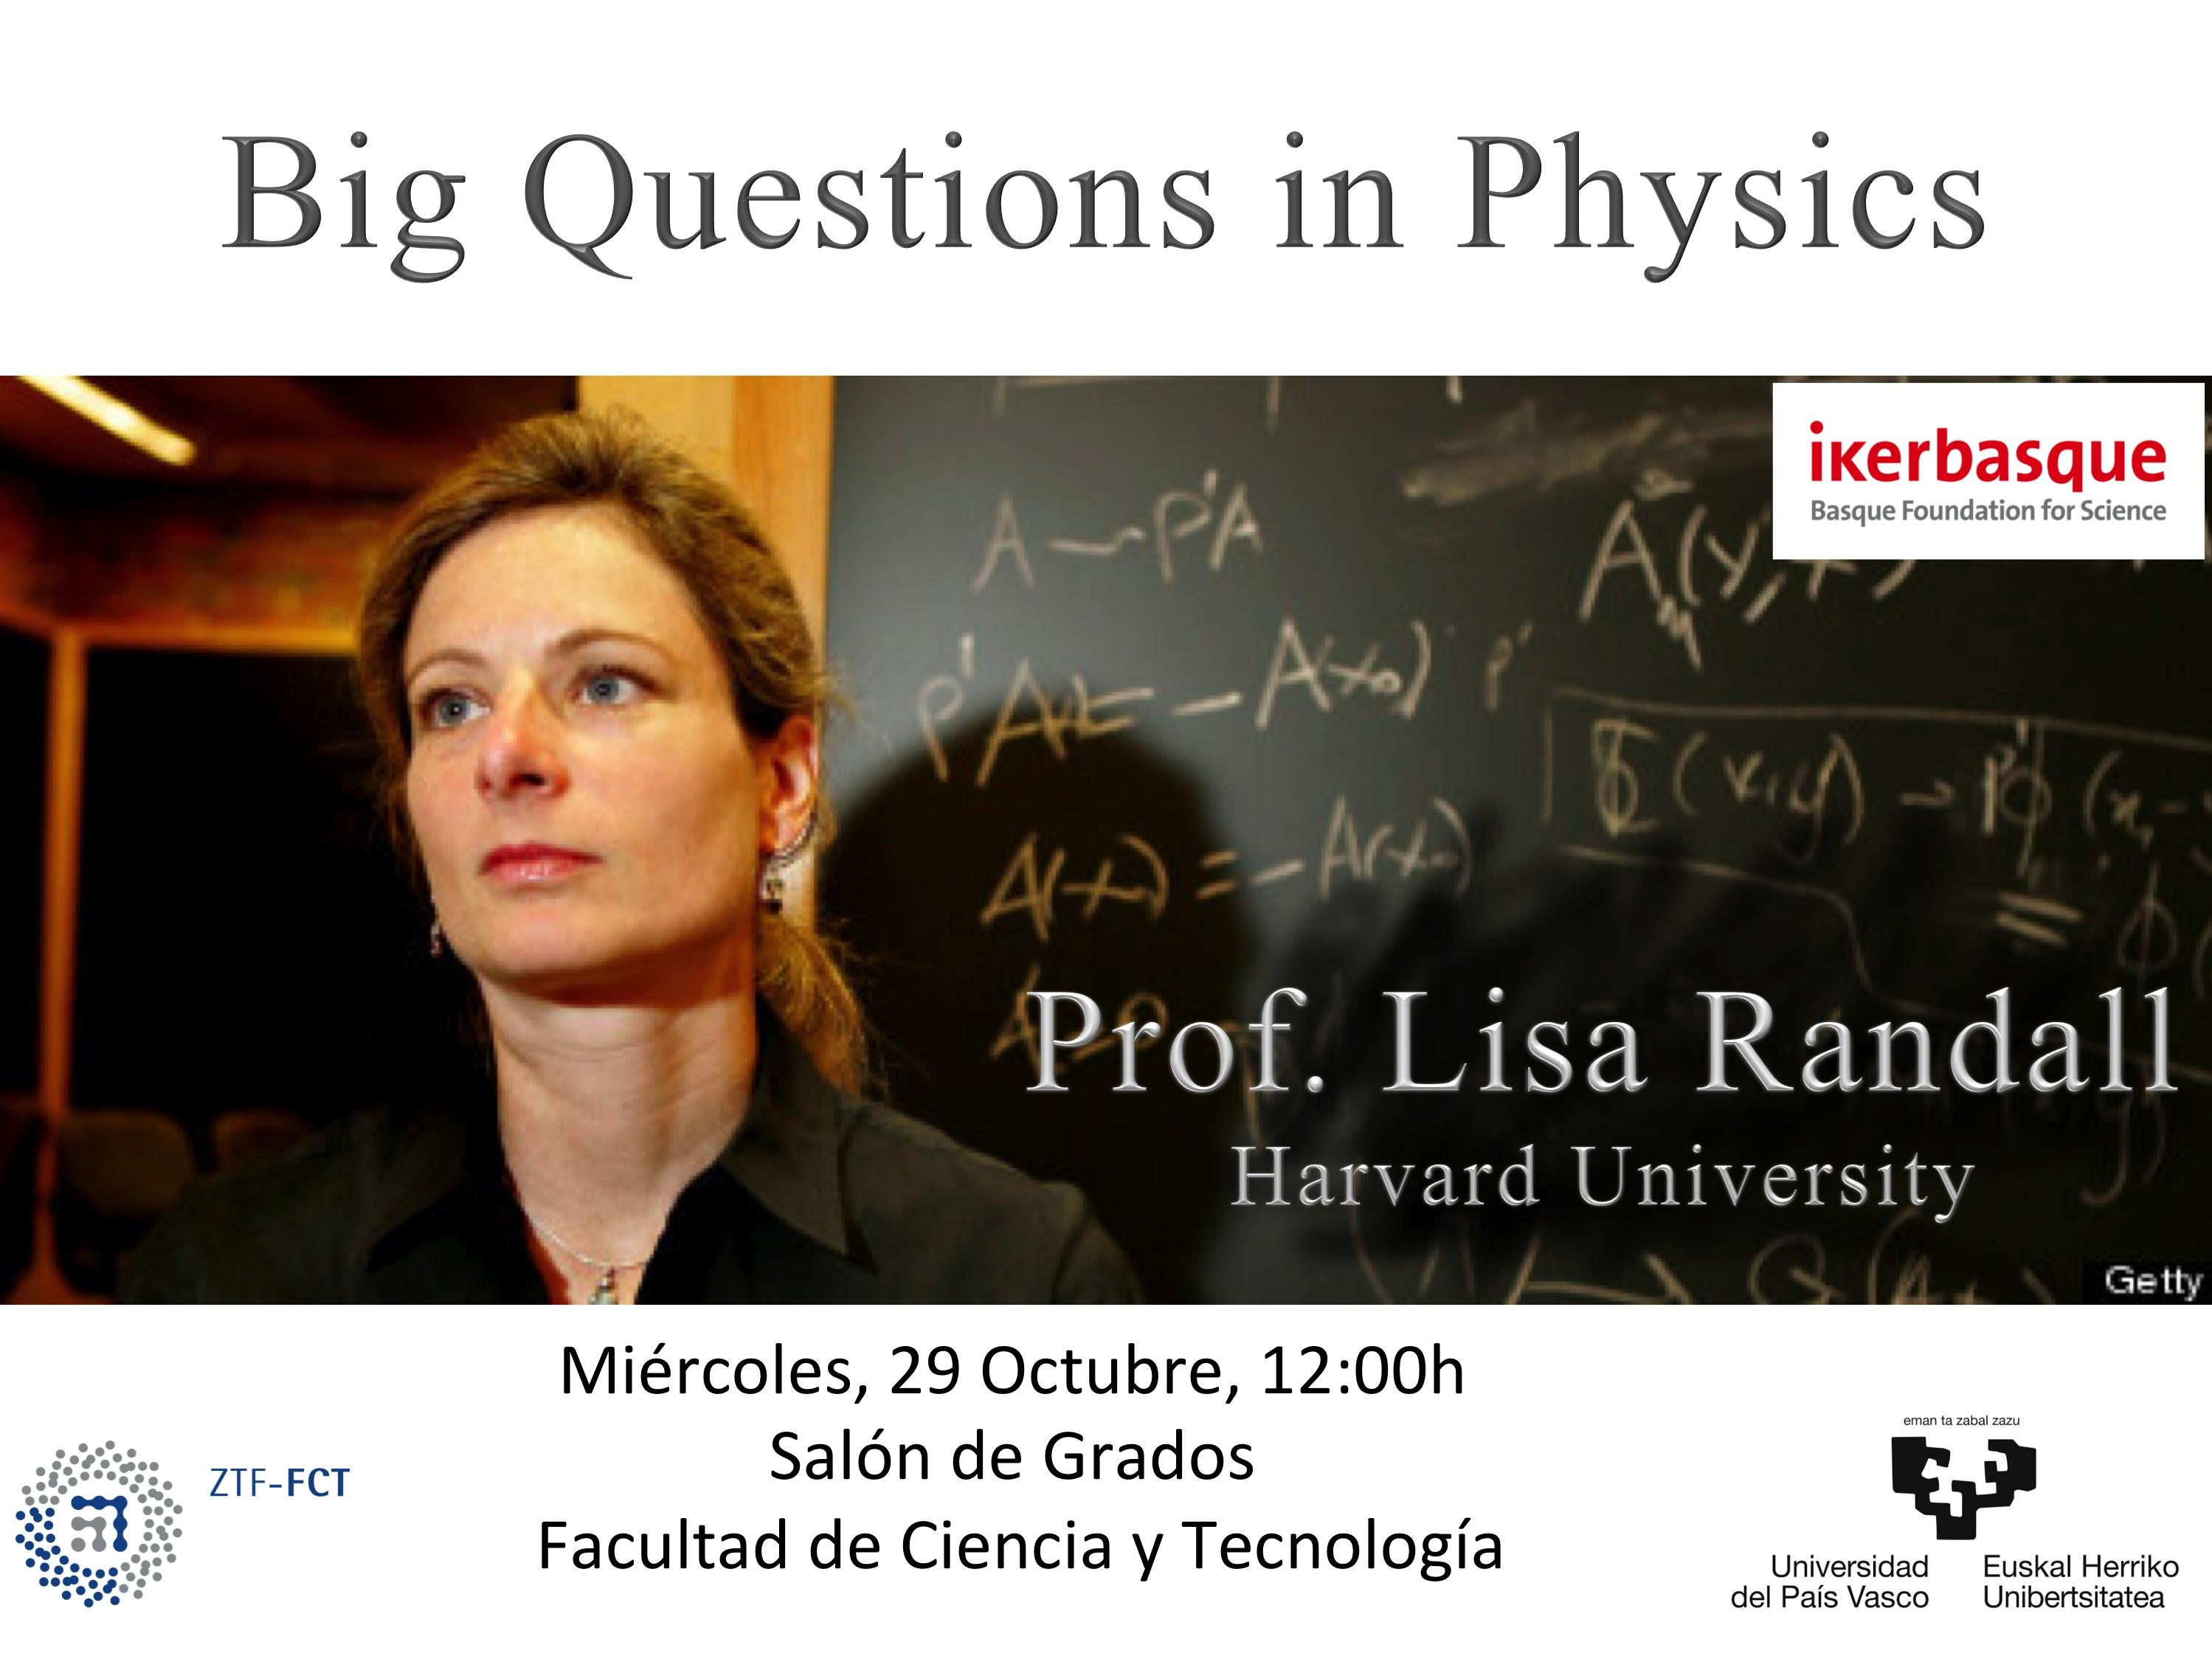 Lisa Randall fisikari ospetsuak hitzaldia emango du bihar UPV/EHUn: Big Questions in Physics